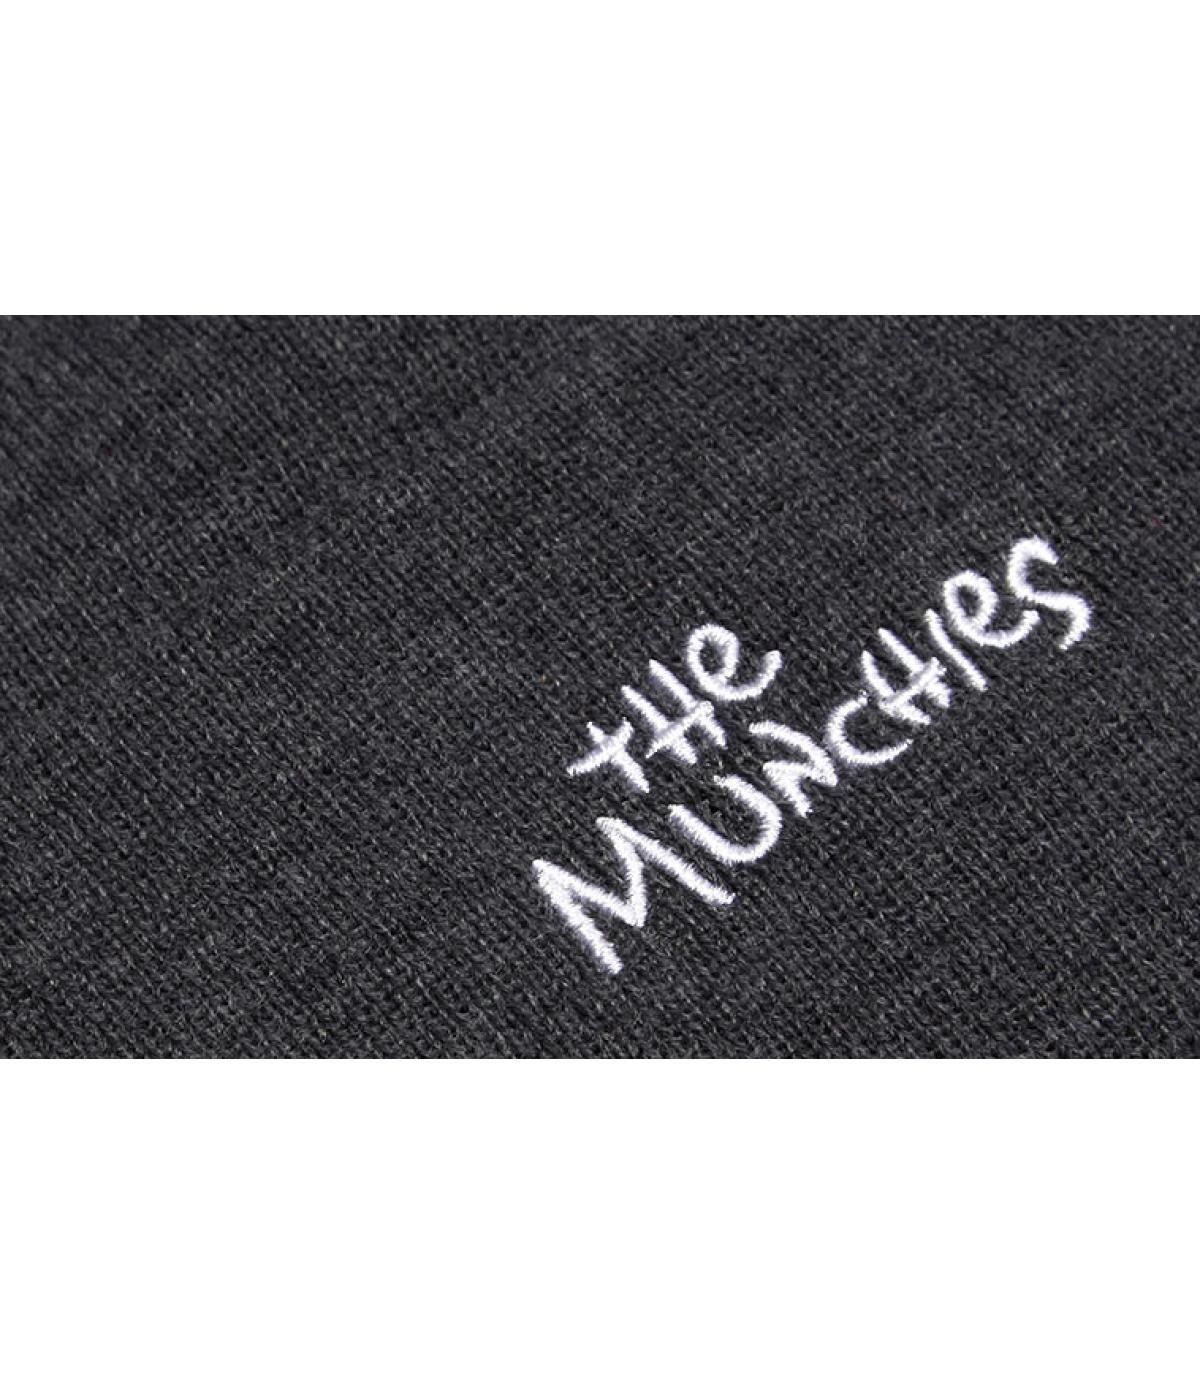 Details Los Munchos Beanie grey - Abbildung 5